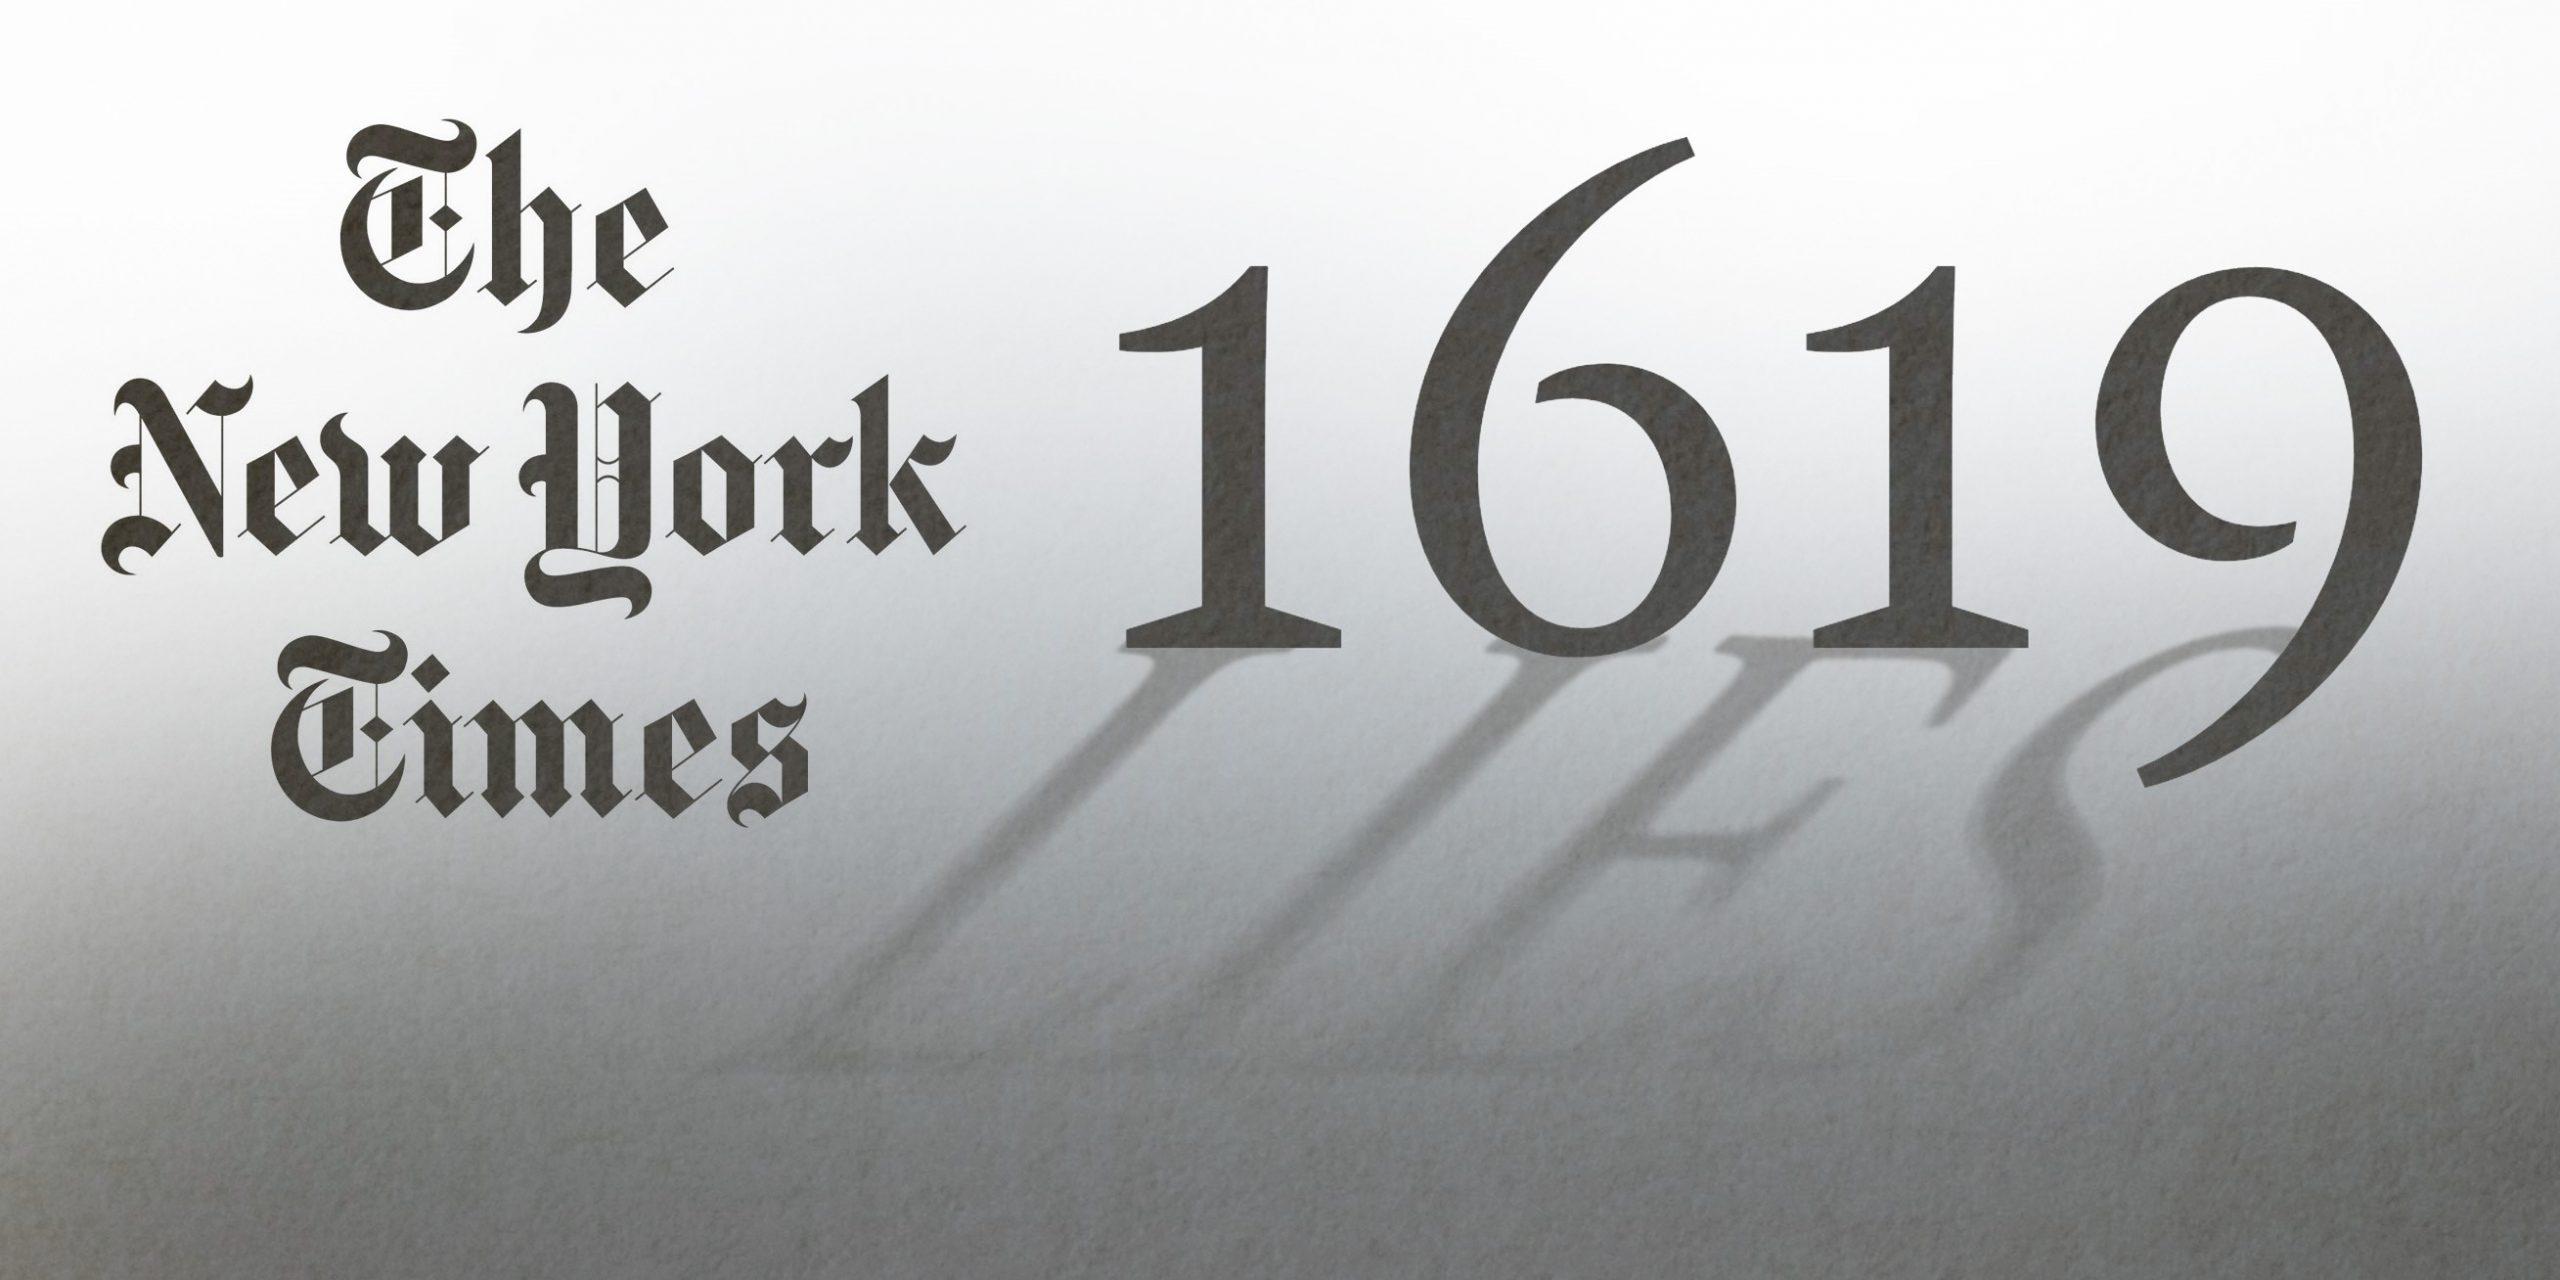 § 1619